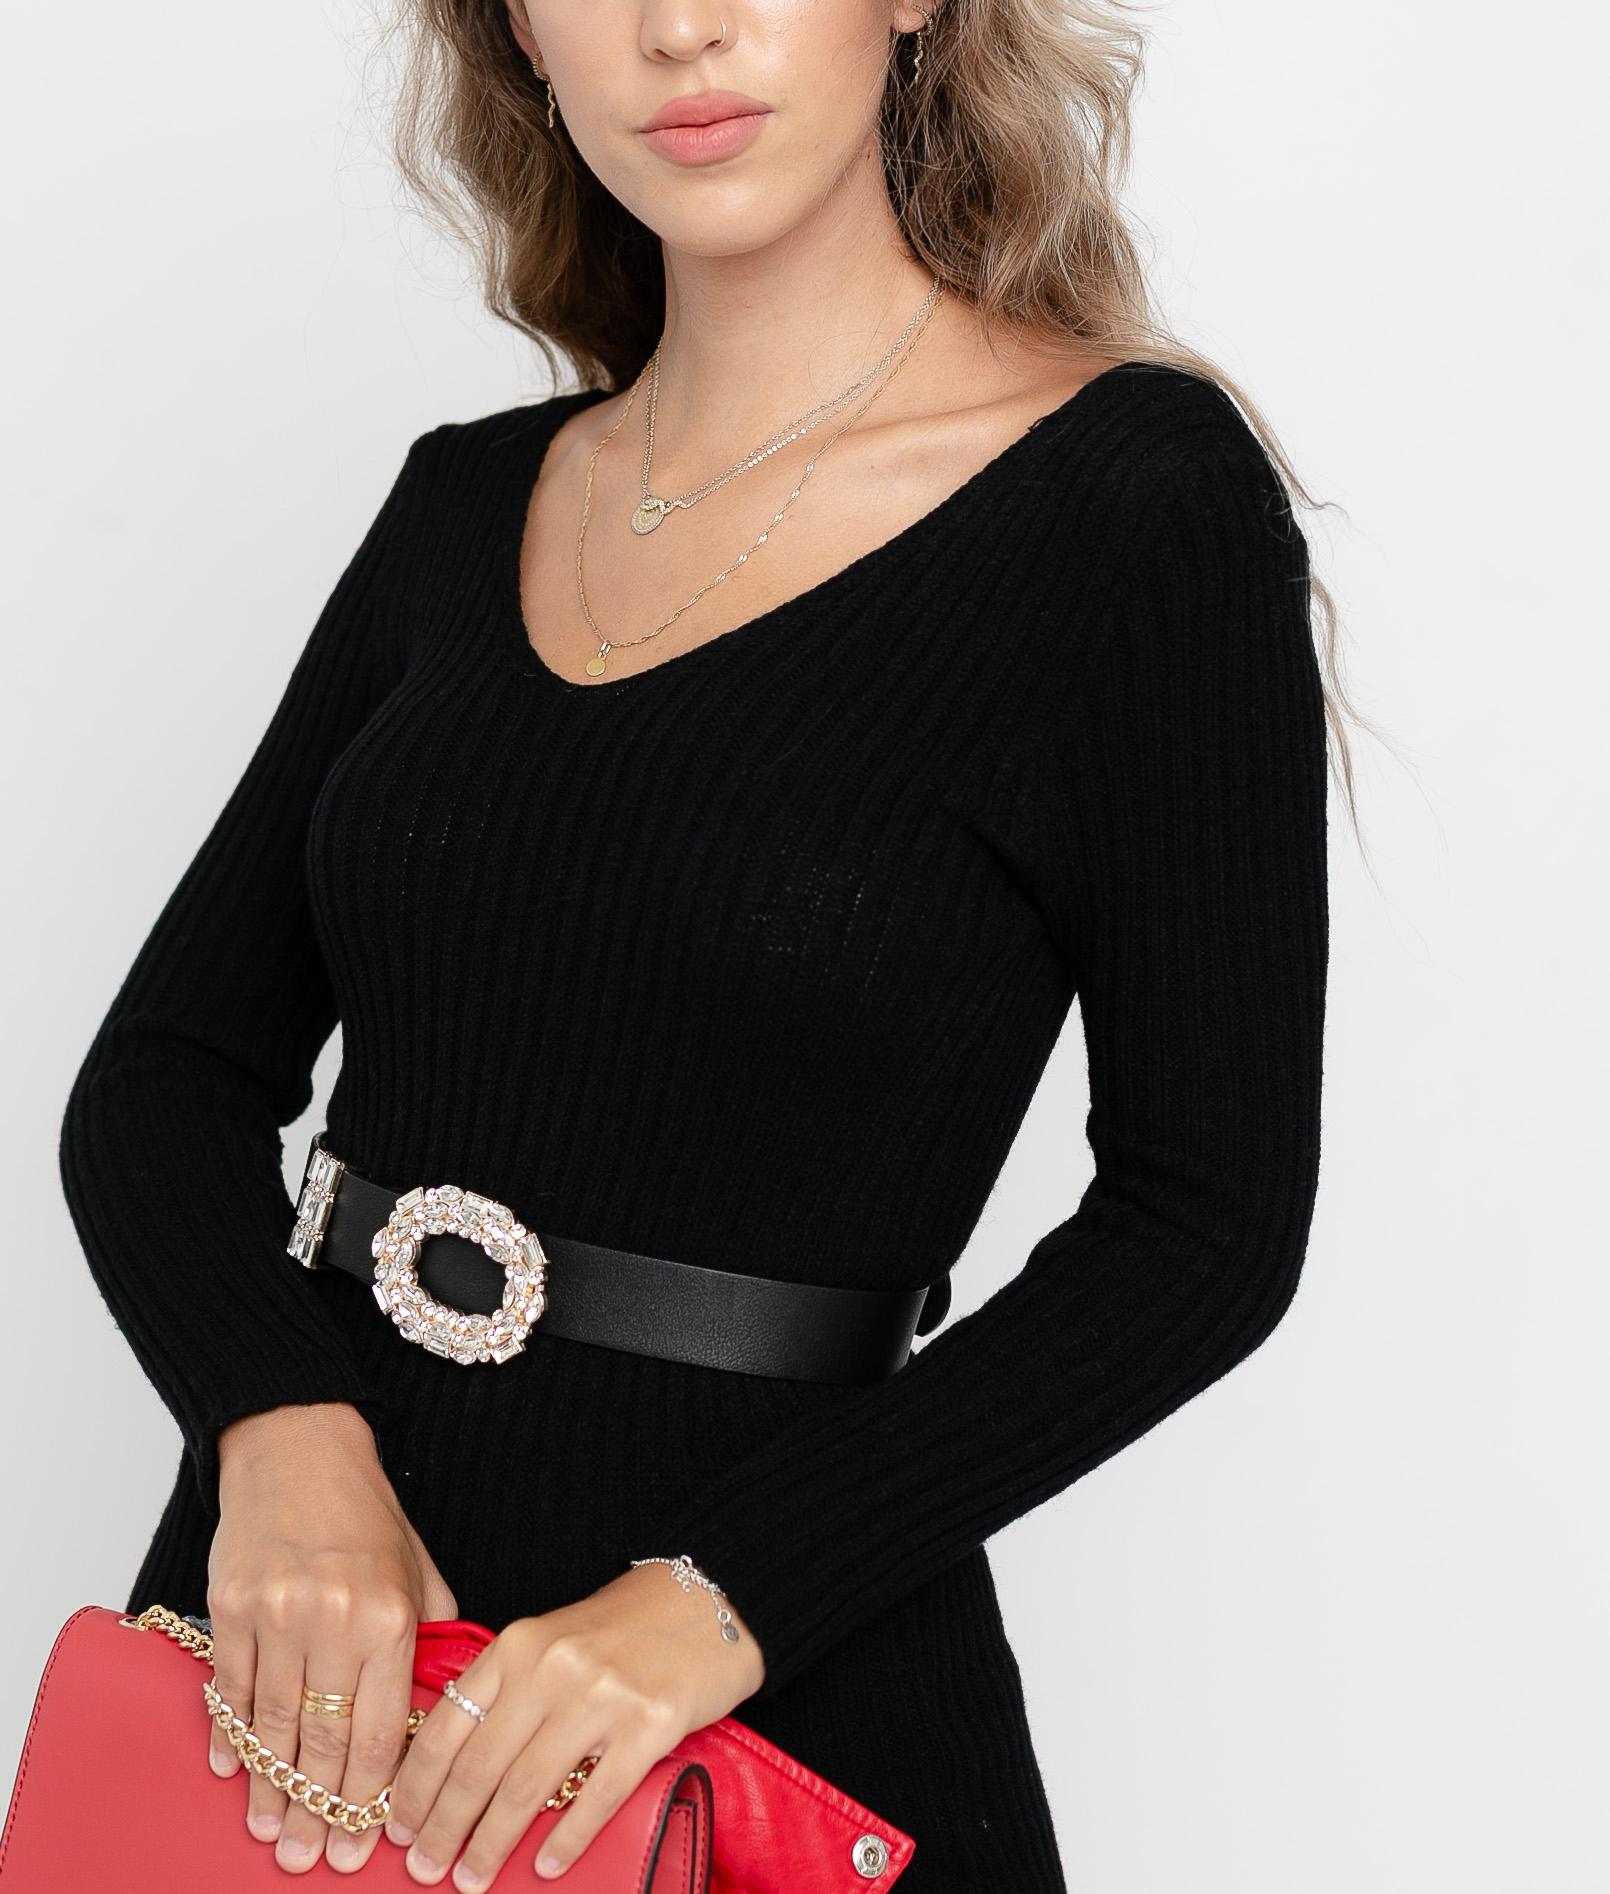 Artabi Dress - Black